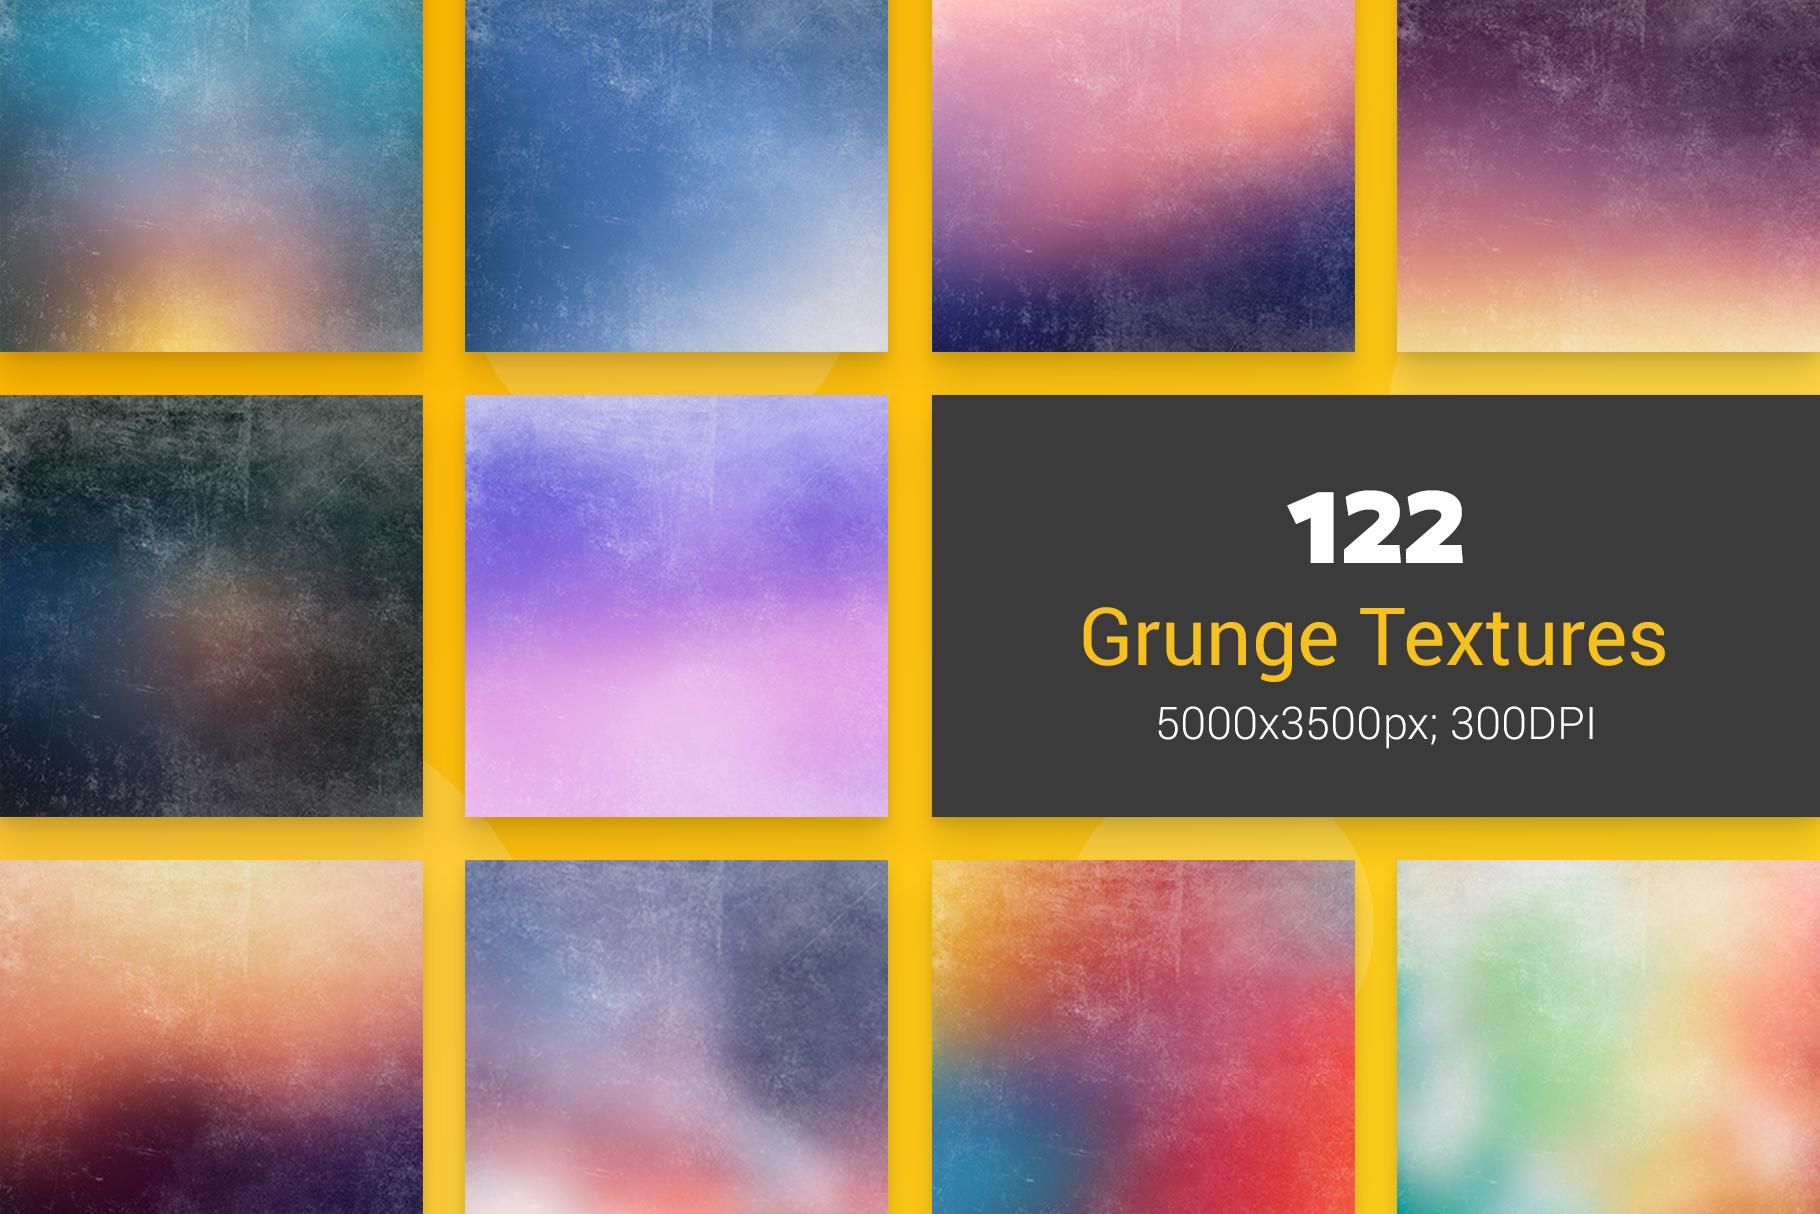 2364 Premium High Resolution Textures example image 3